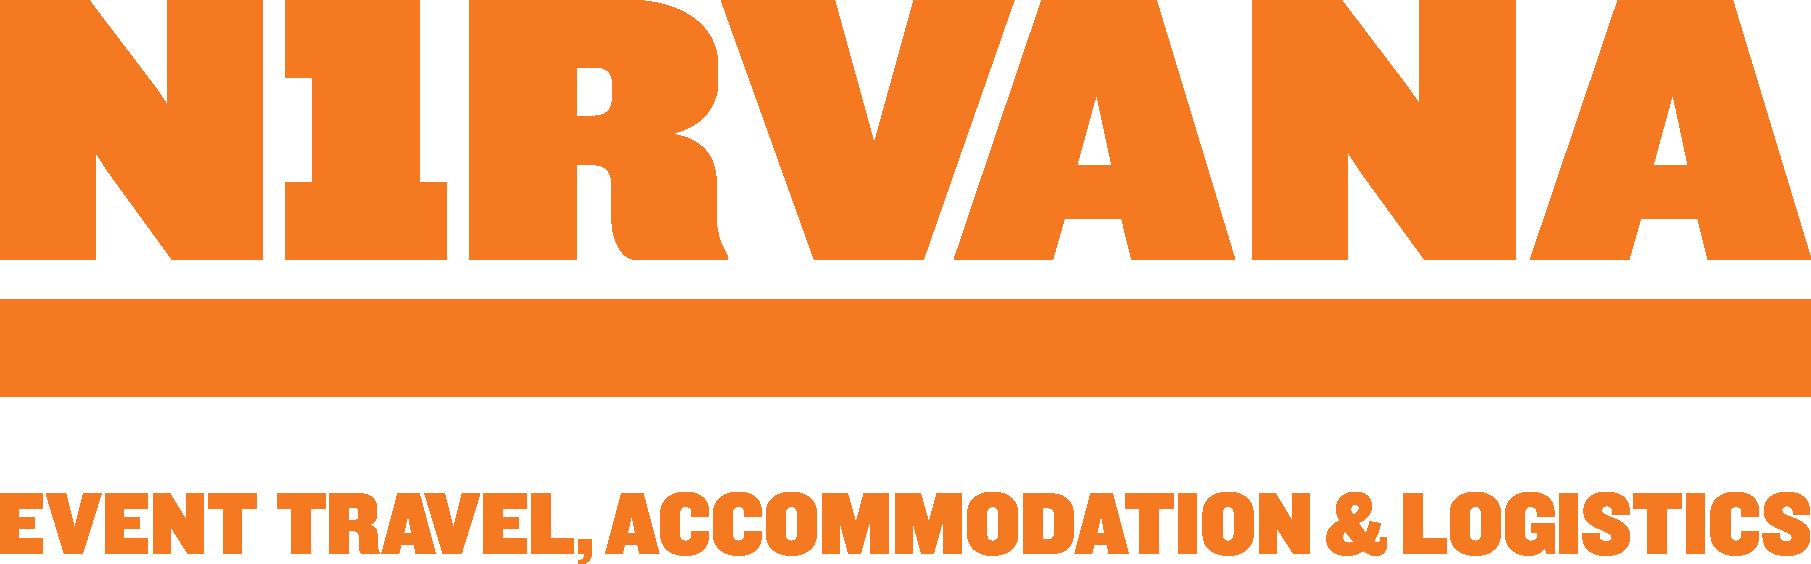 Official Nirvana Event Travel, Accommodation and Logistics partner logo